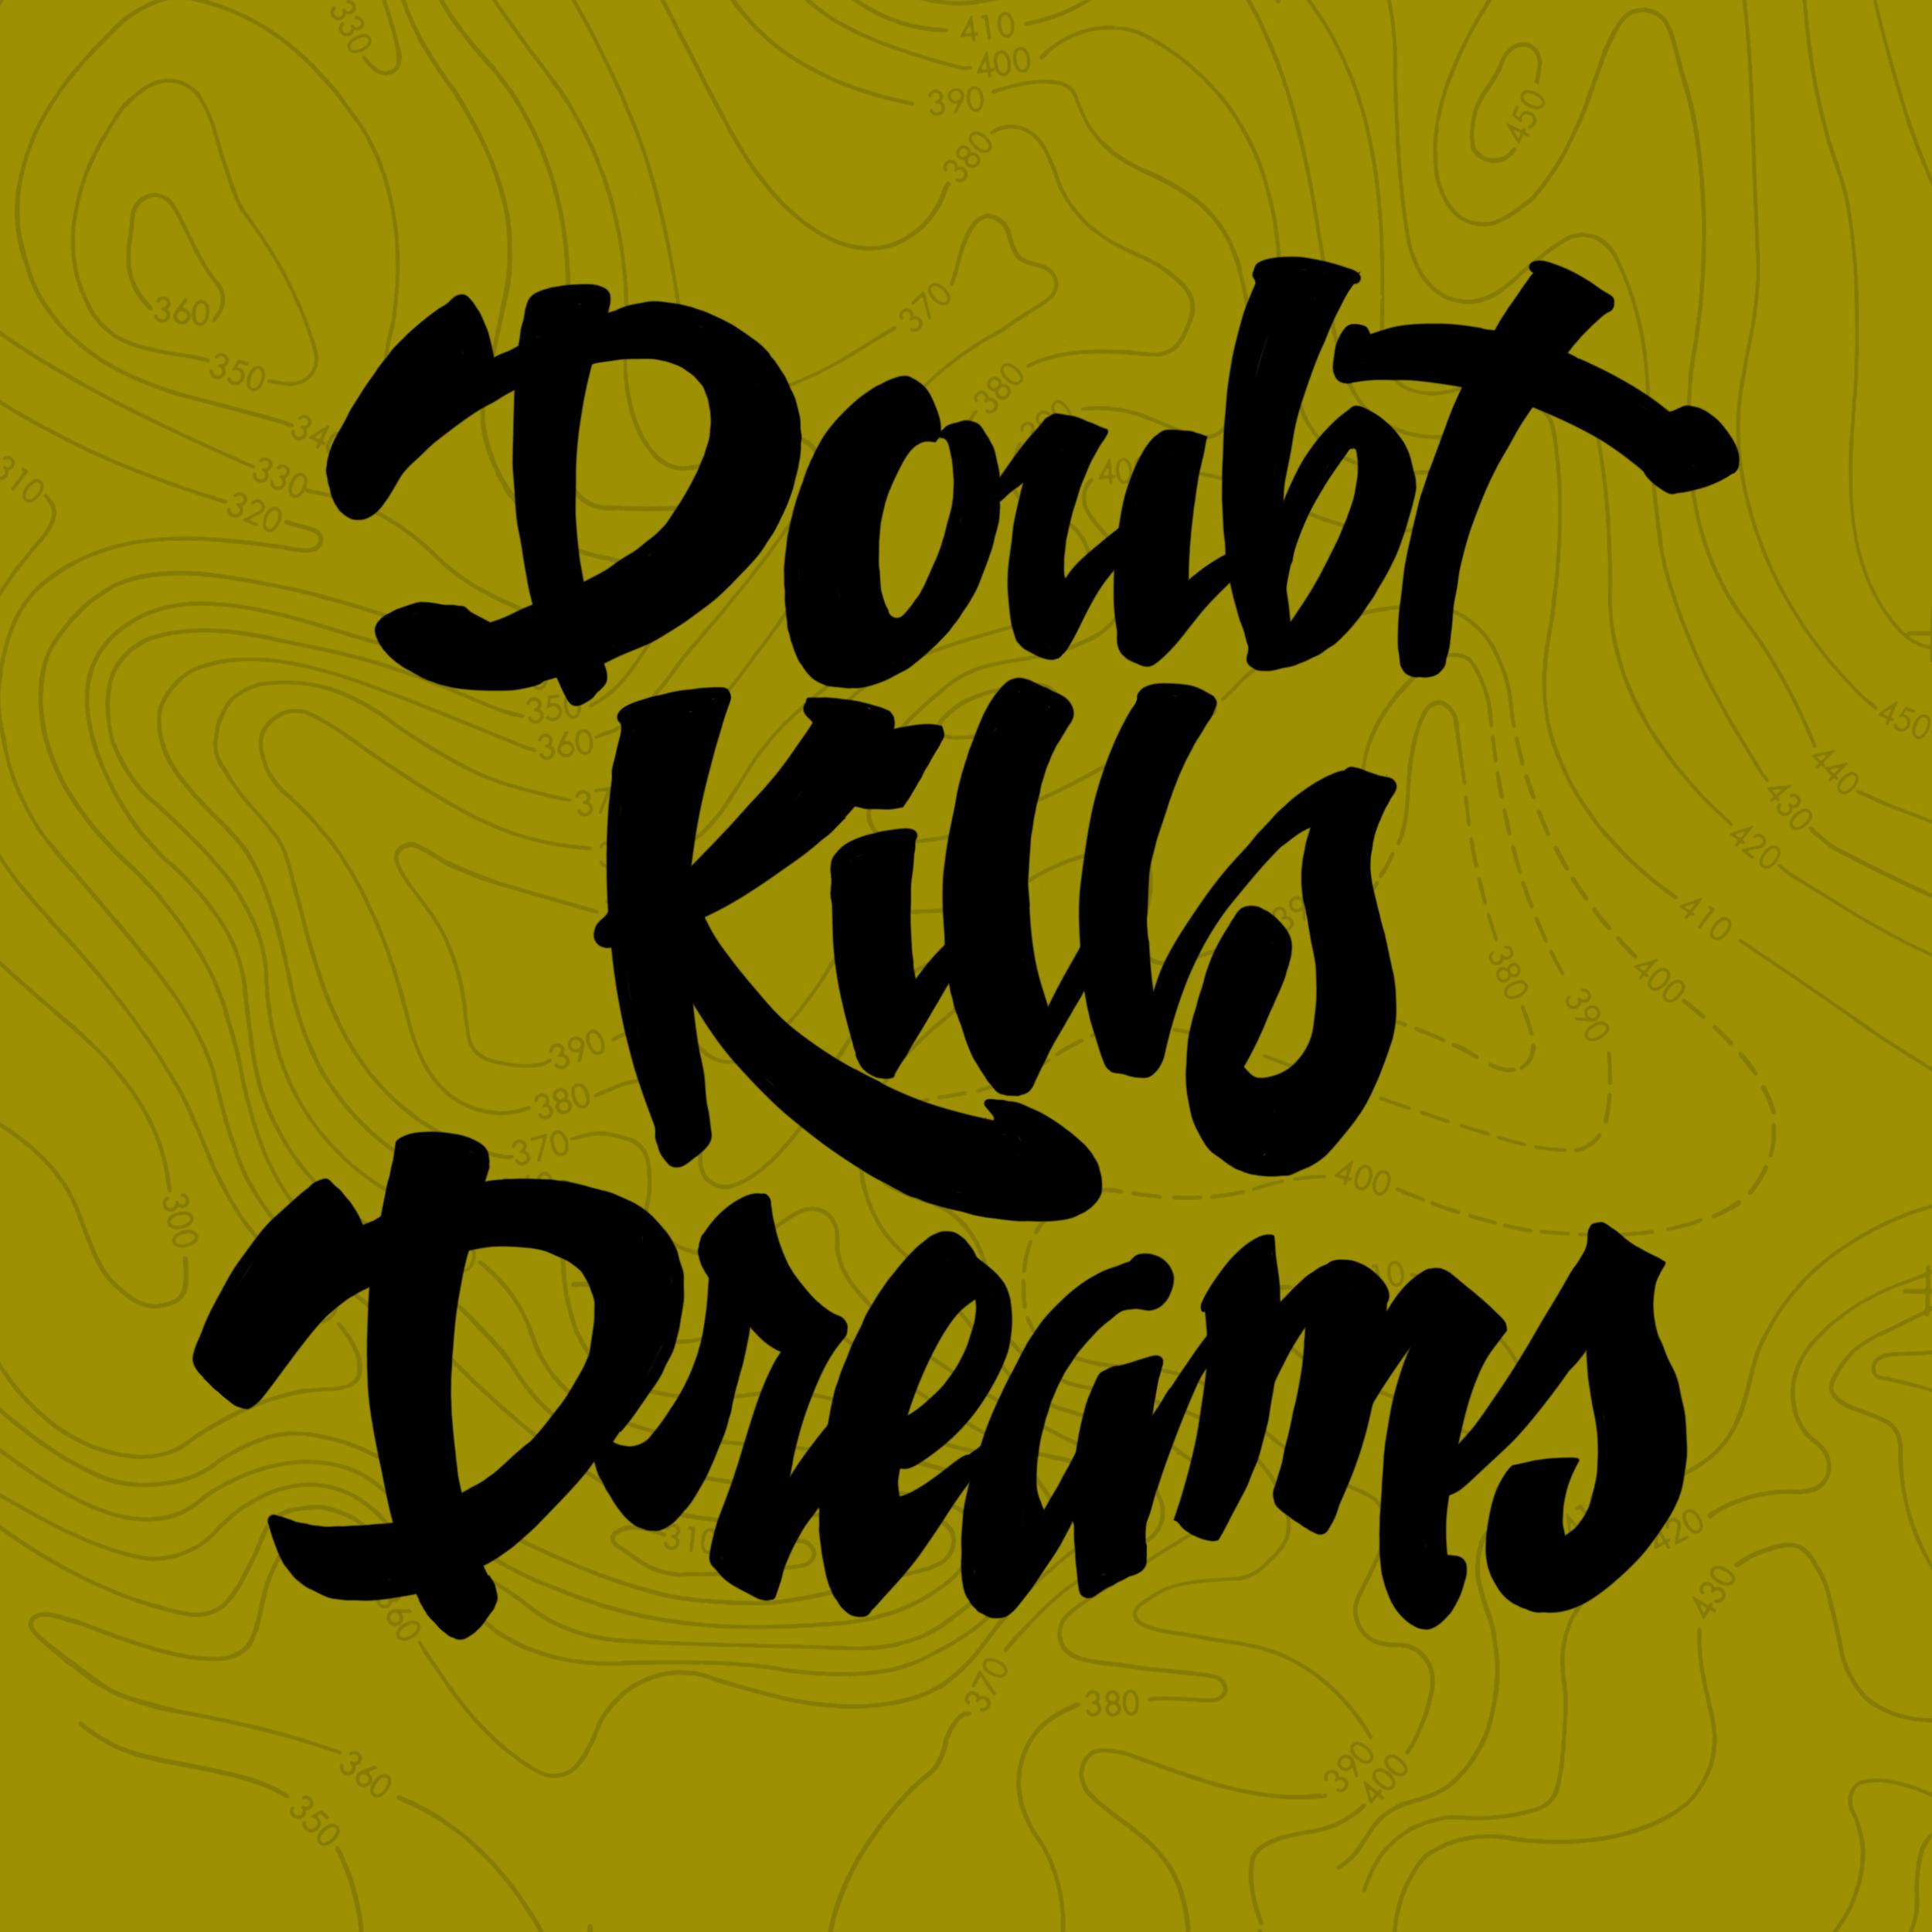 doubt kills dreams by john suder.png